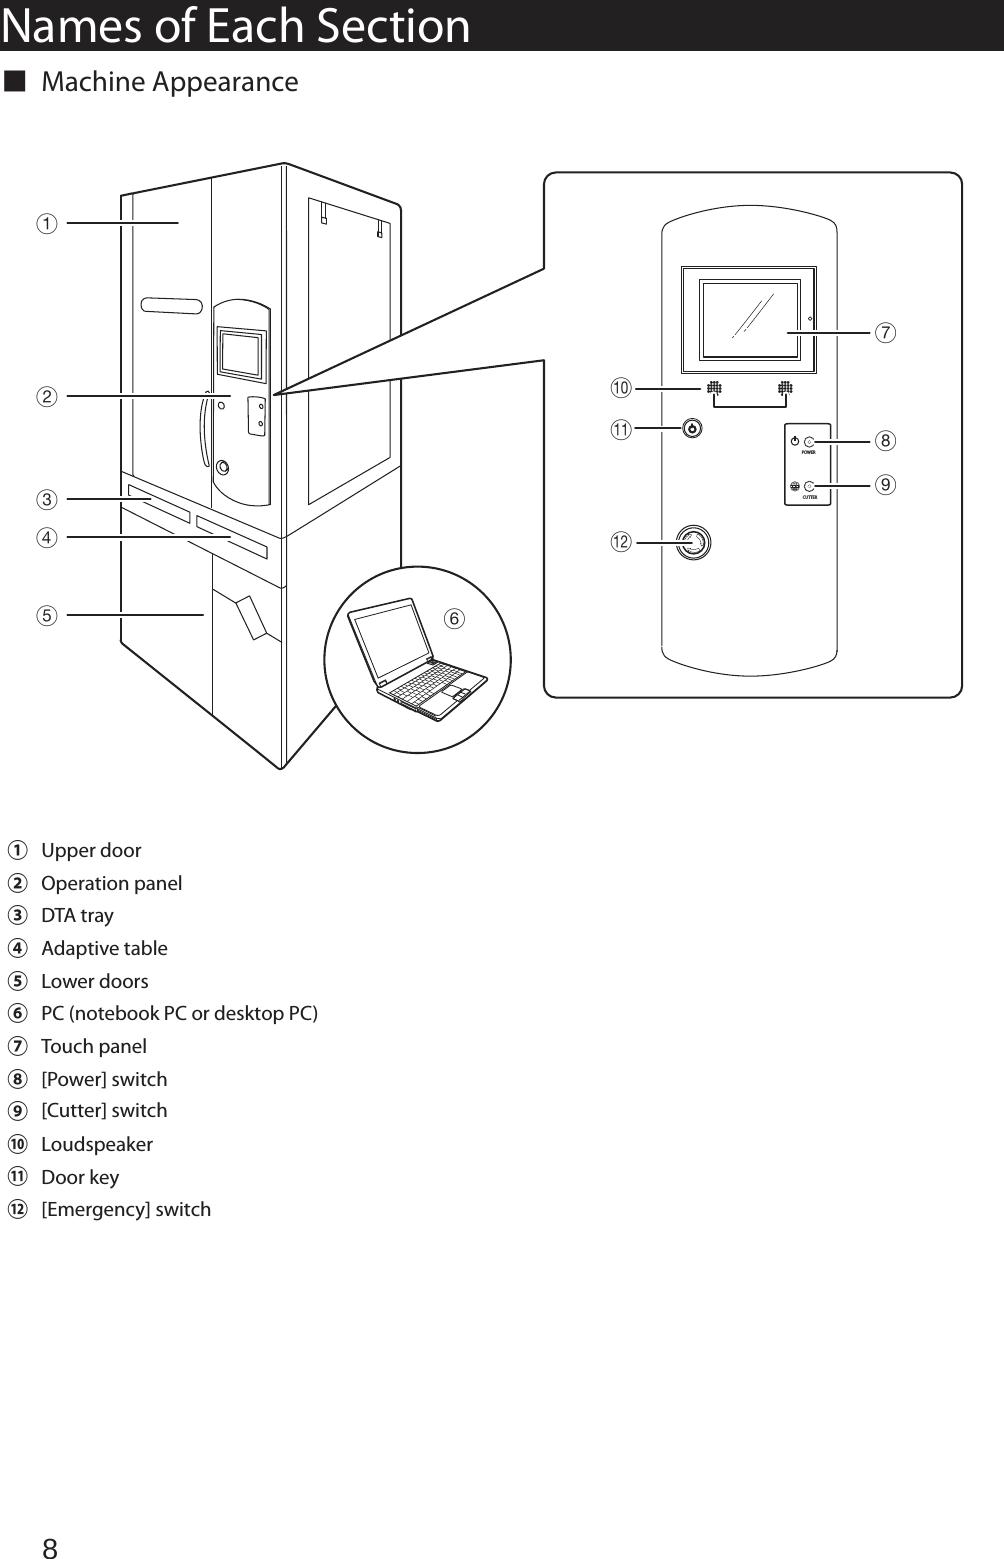 YUYAMA MFG F321A RFID module User Manual 09 PROUDA 09 03